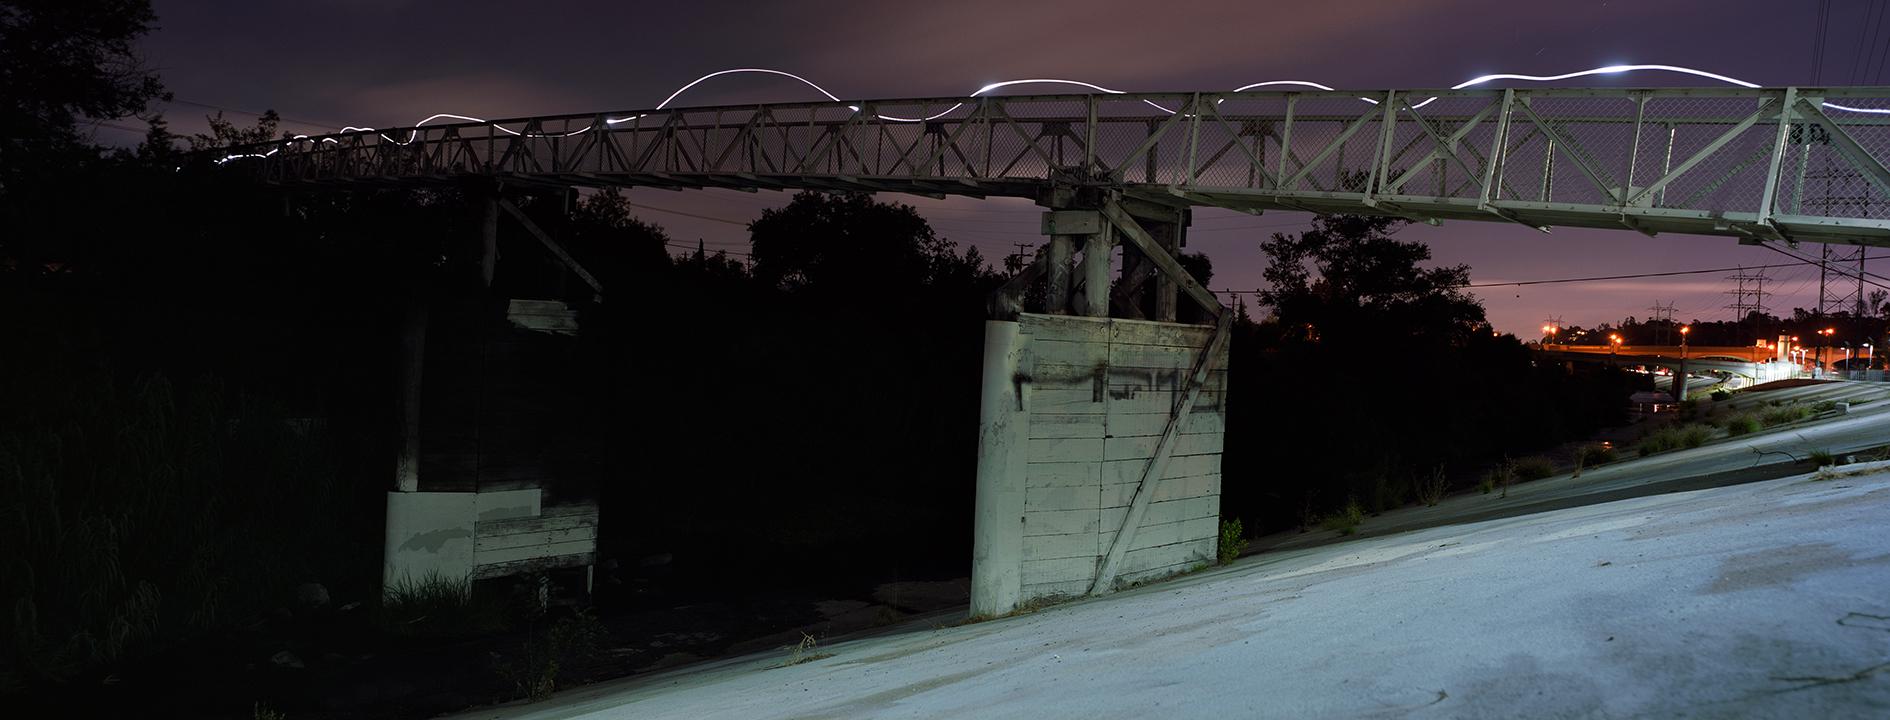 LA River Footbridge